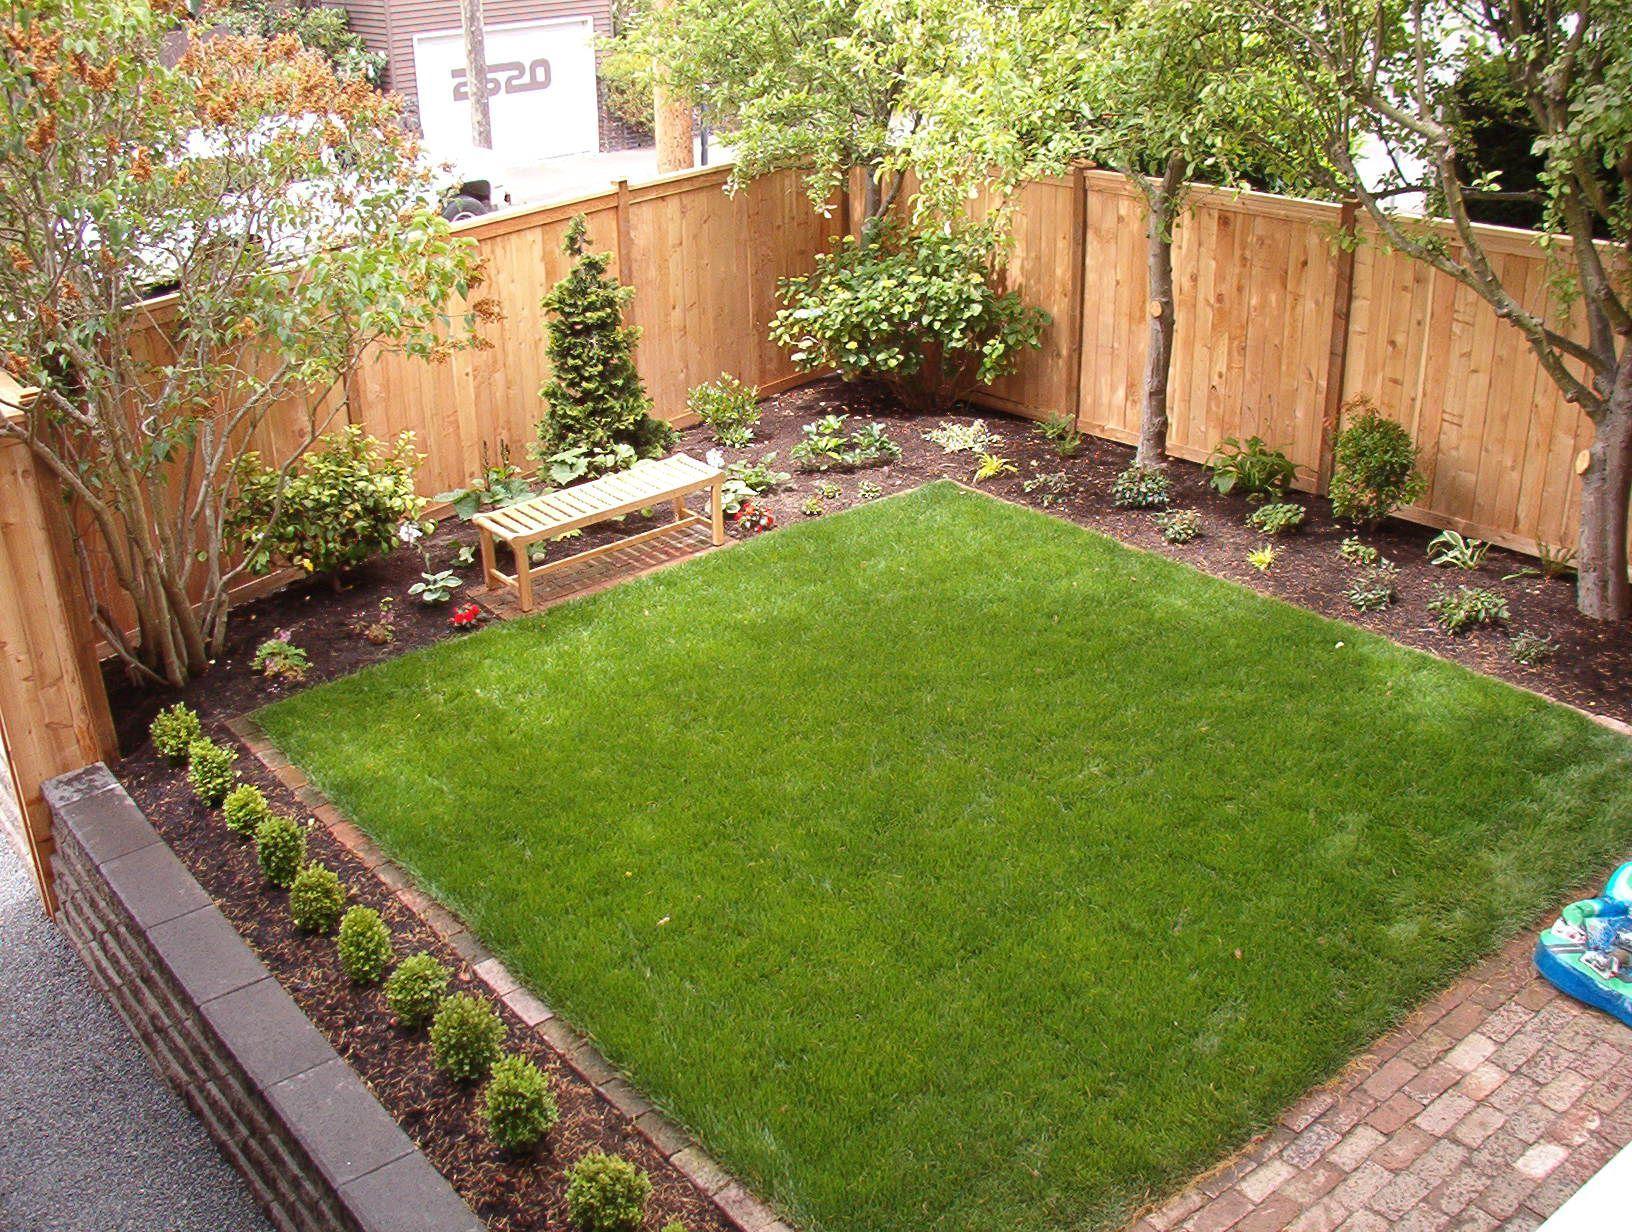 Inspirational Backyard Design Ideas For Small Yards Landscapingfordummies Backyard Landscaping Designs Landscaping Along Fence Backyard Fences